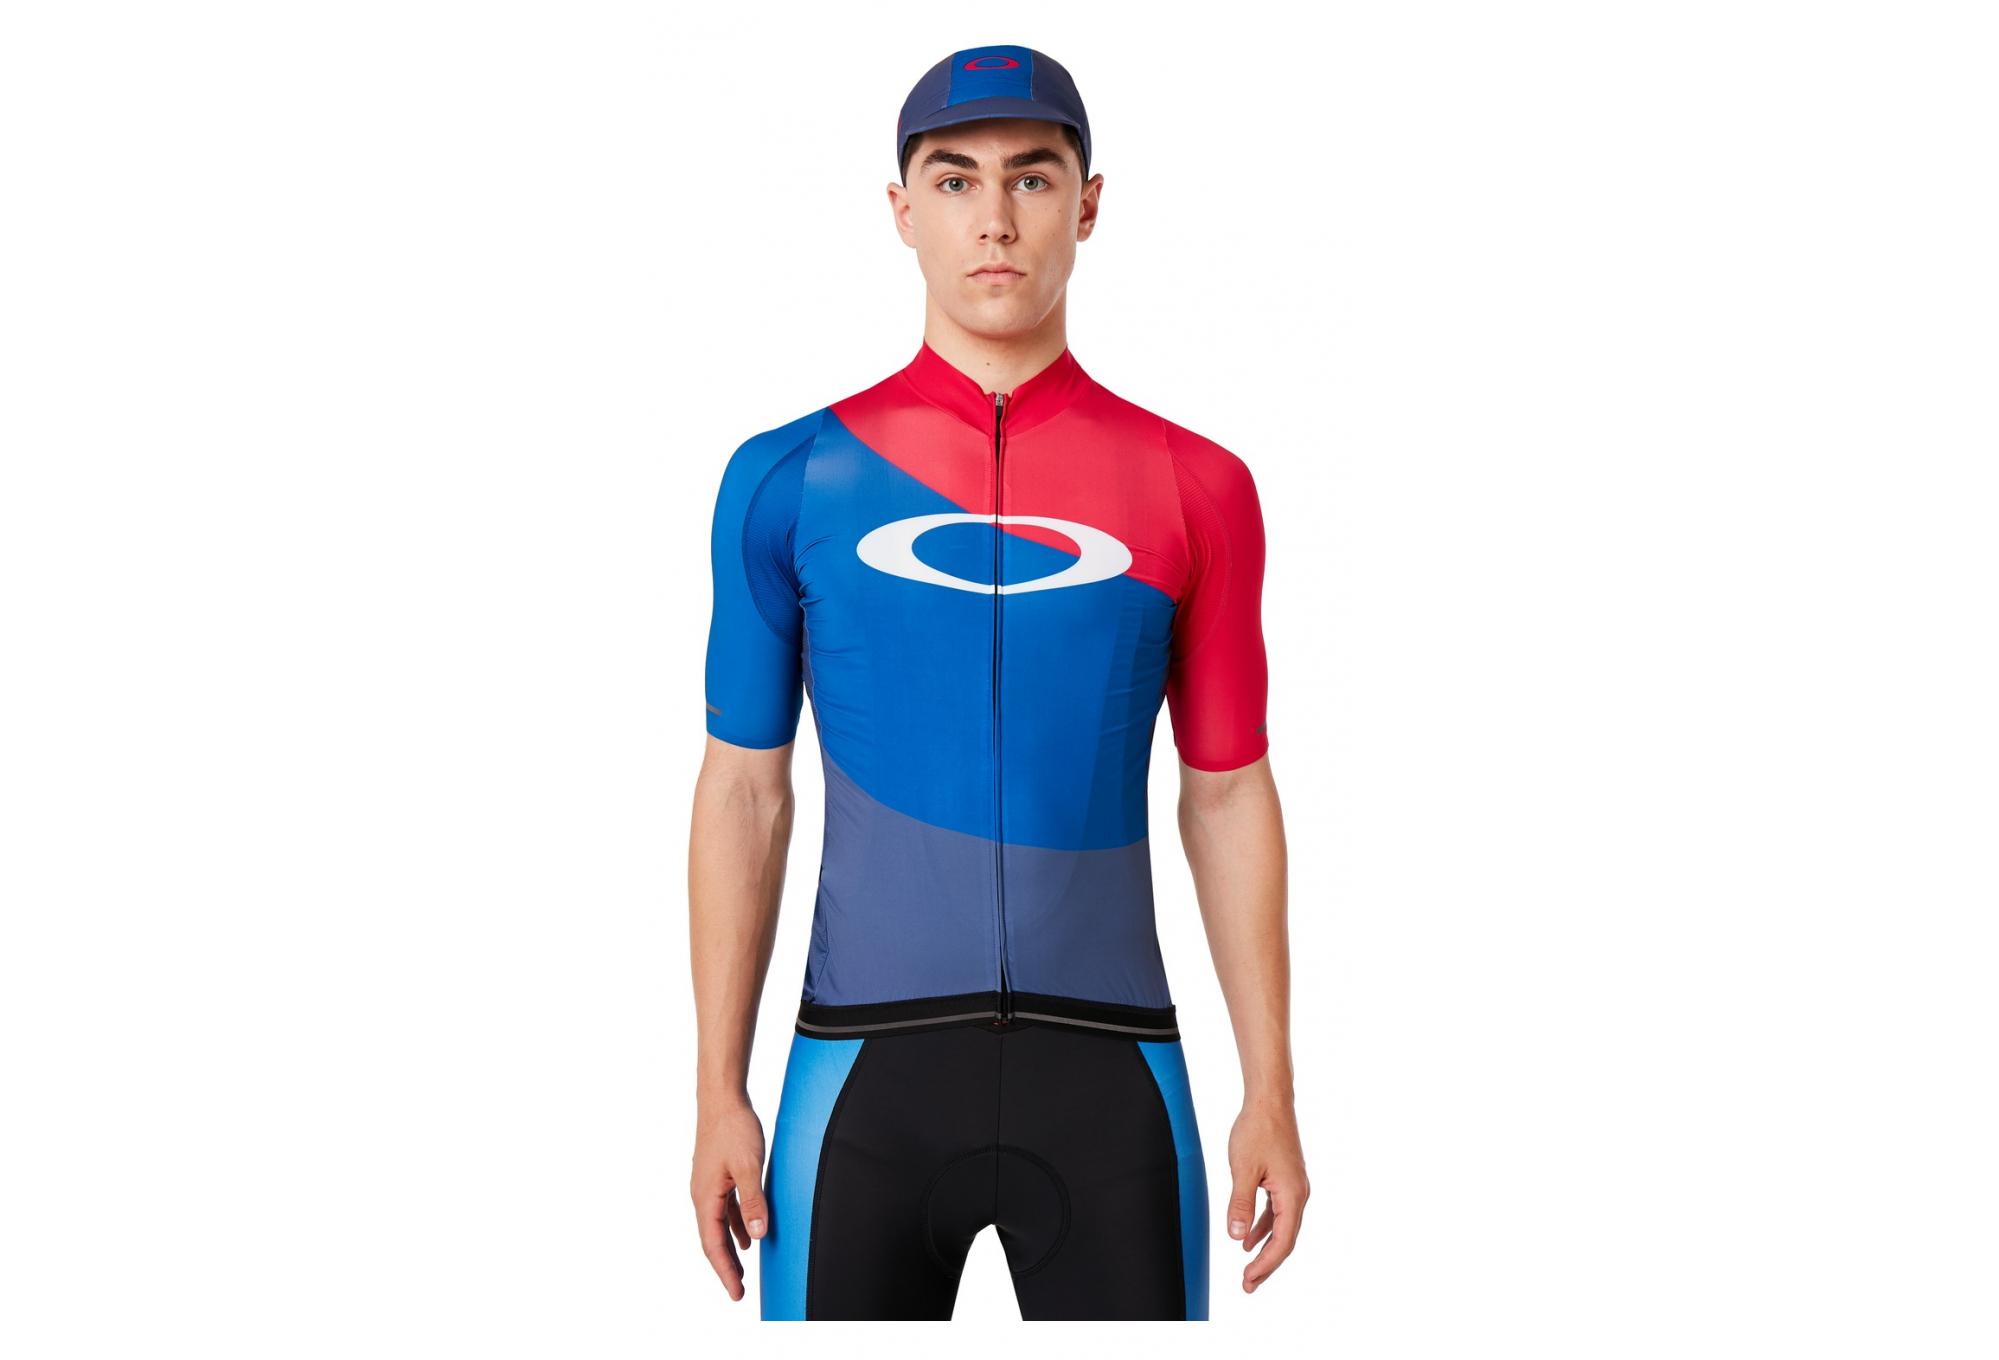 lega Grado Celsius buio  Oakley Aero Foggy Blue / Blue / Red Short Sleeve Jersey   Alltricks.com